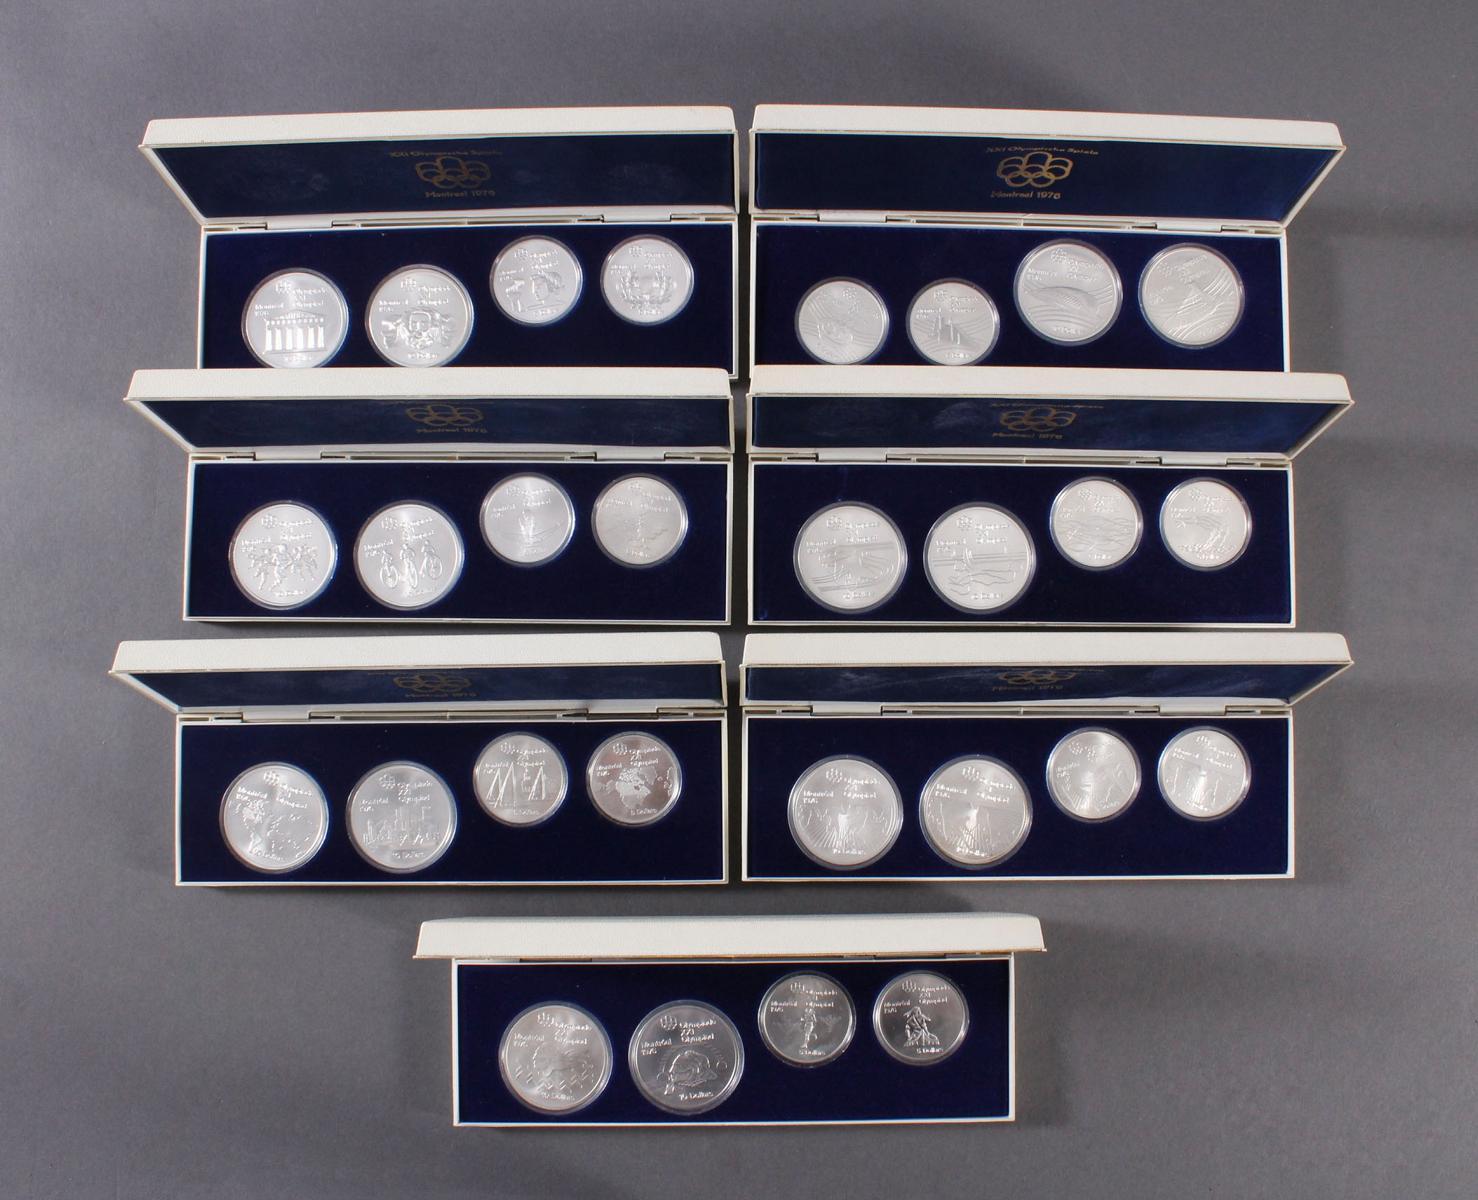 28x Silbermünzen Montreal 1976, kompletter Satz